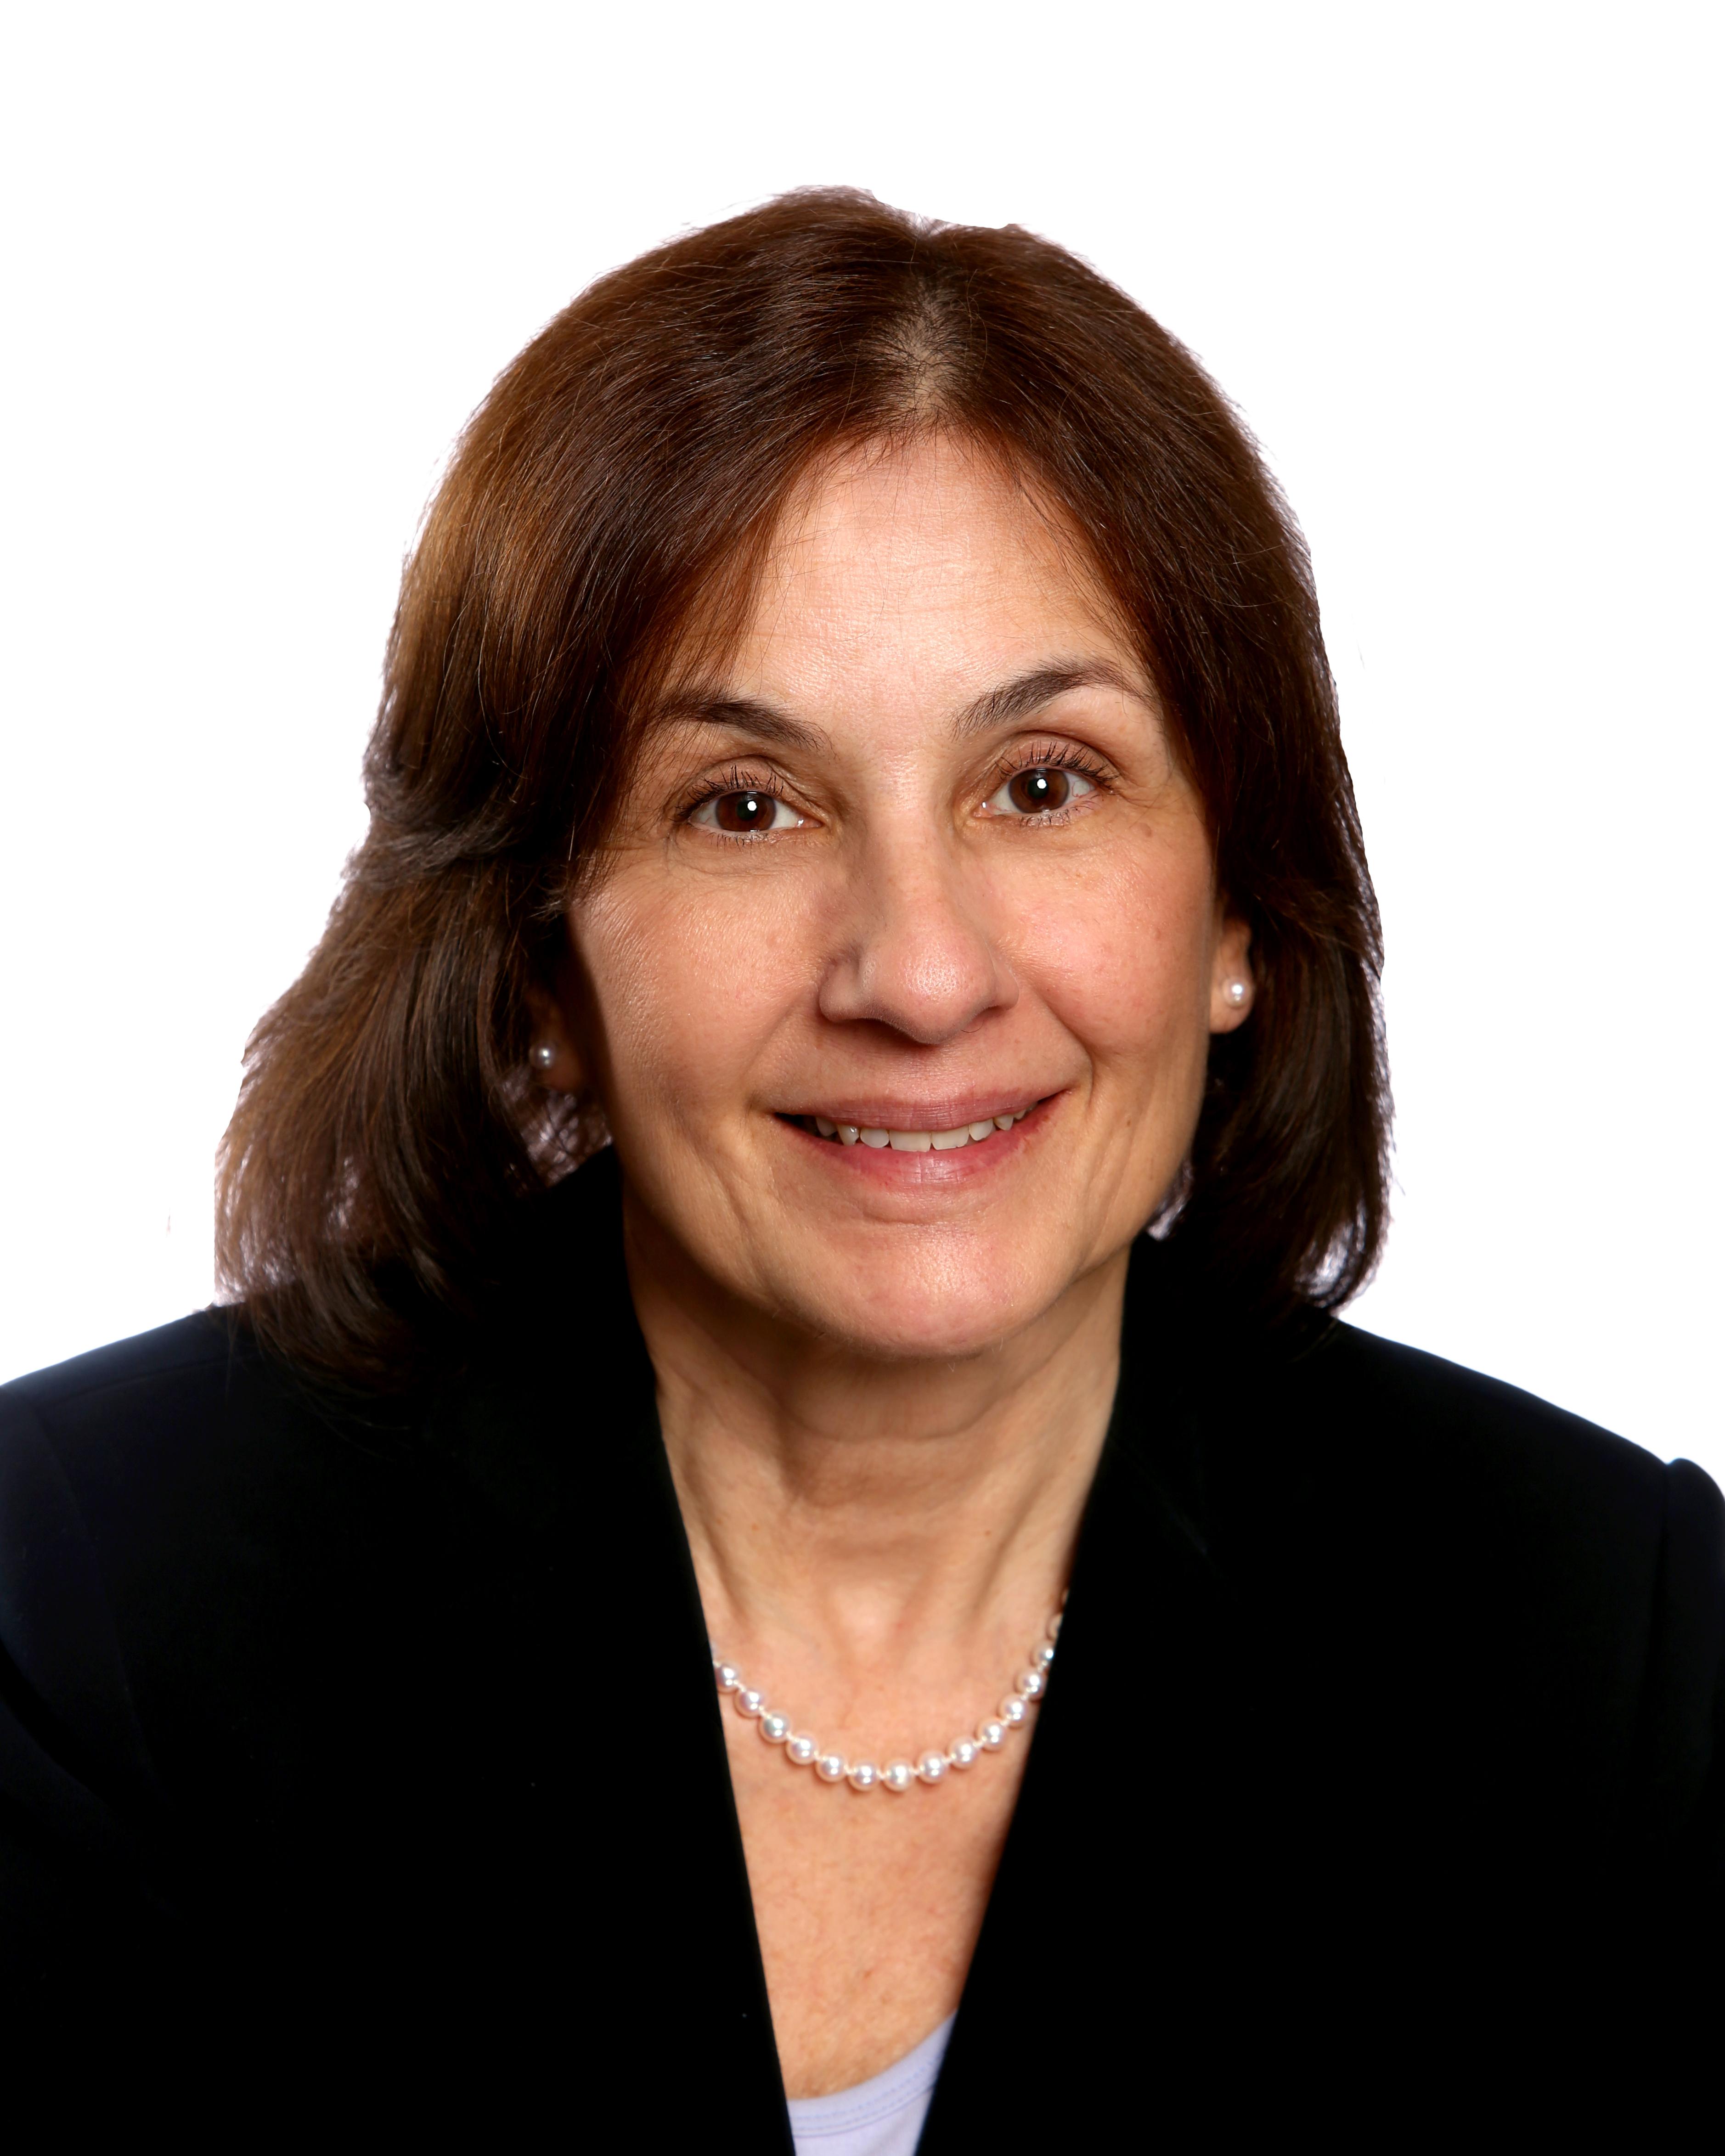 Deborah Hamel